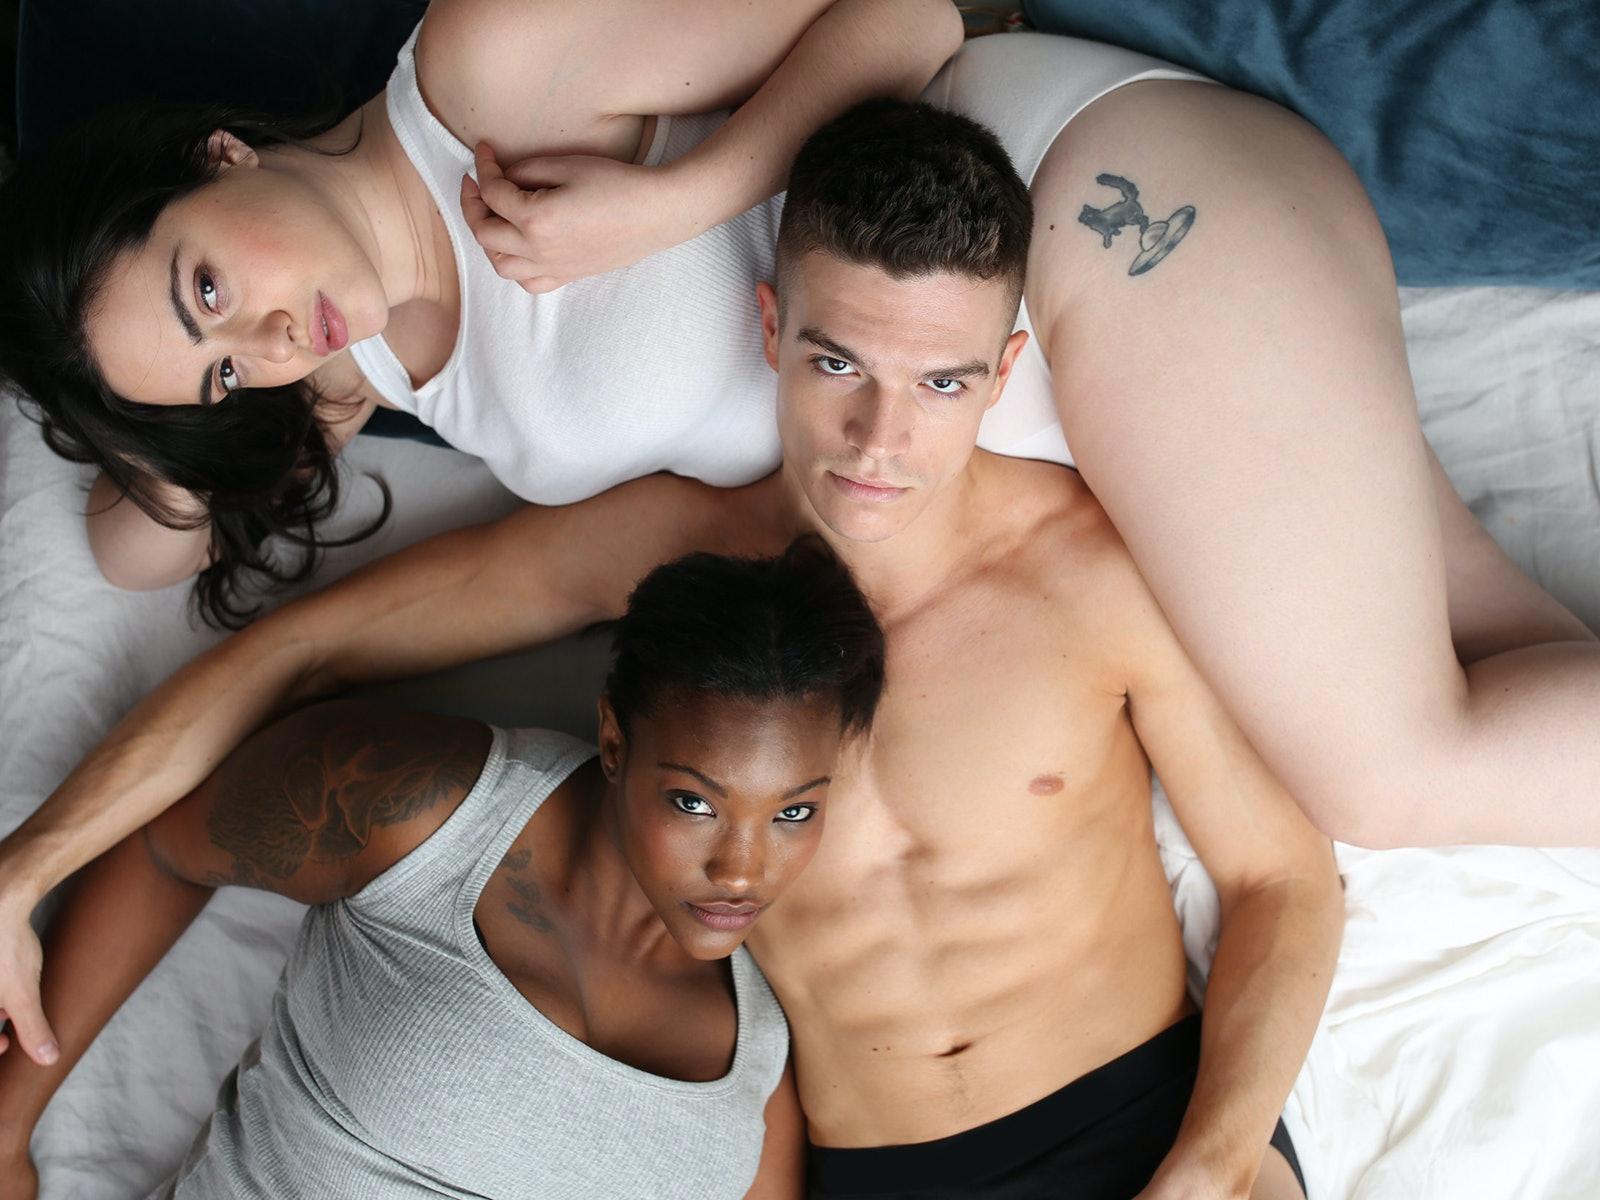 Women having threesomes